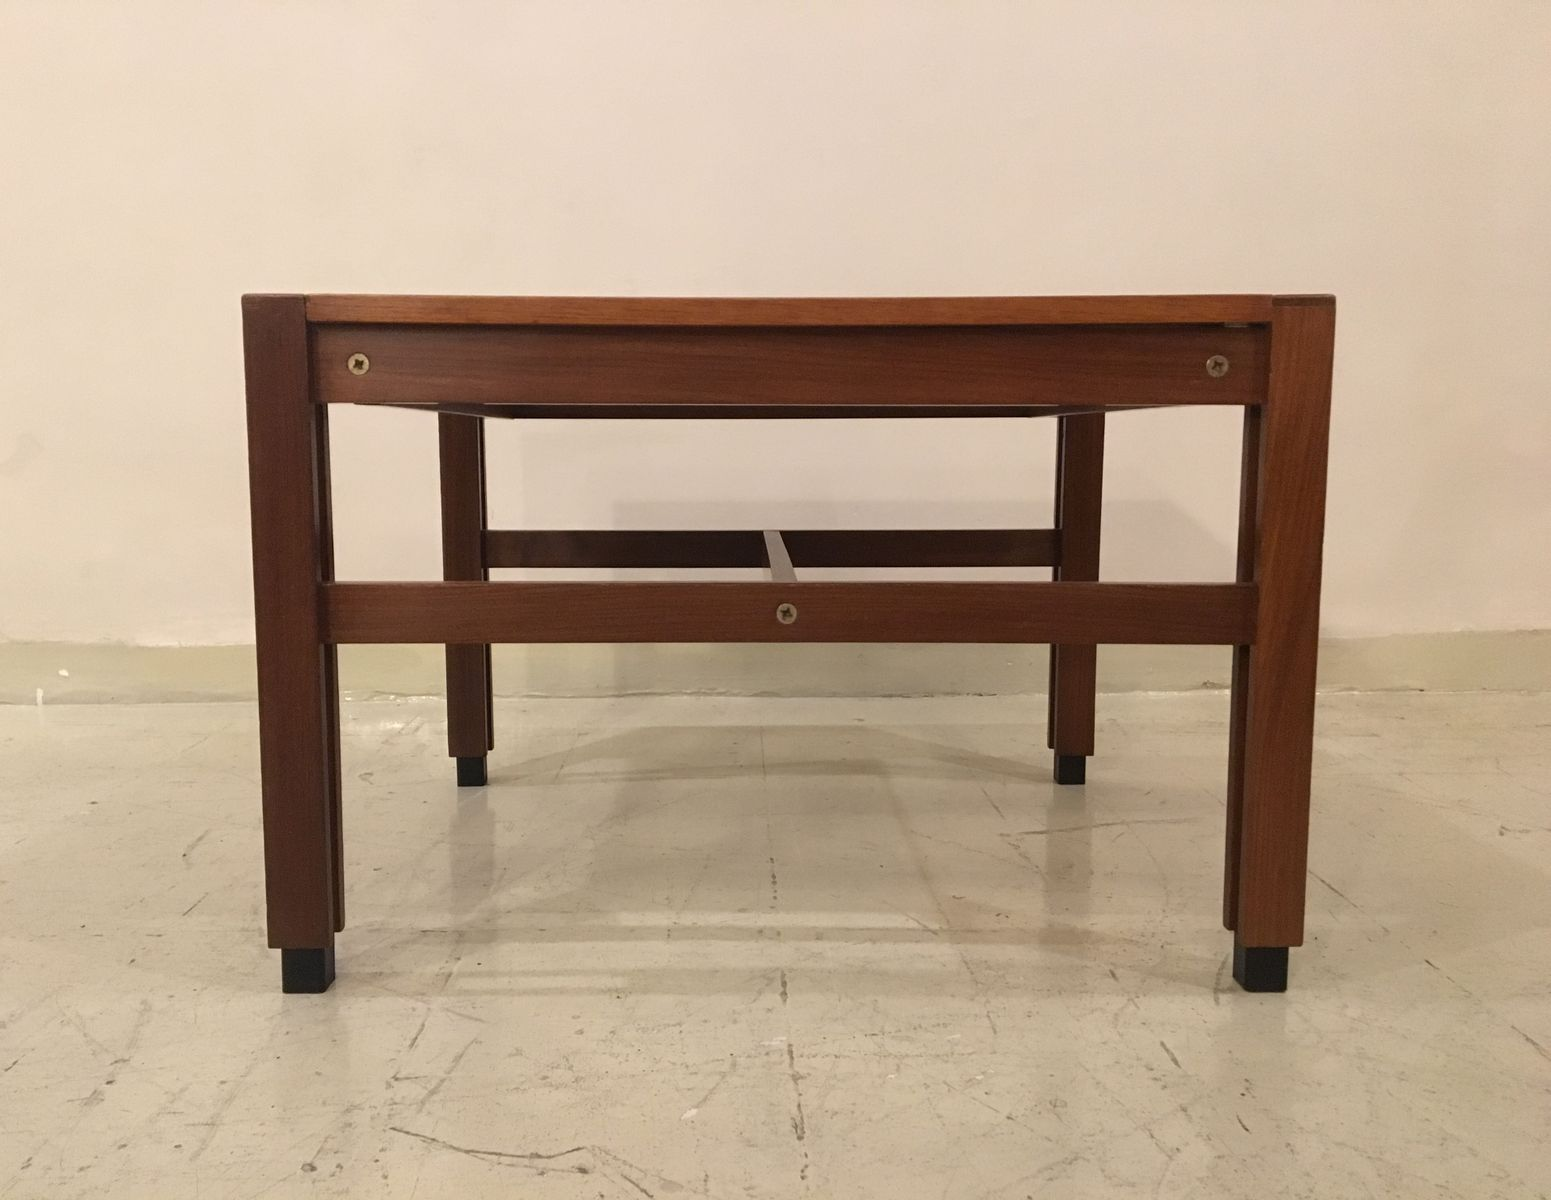 Mobili Italiani Moderni : Arona low table by ico & luisa parisi for mim mobili italiani